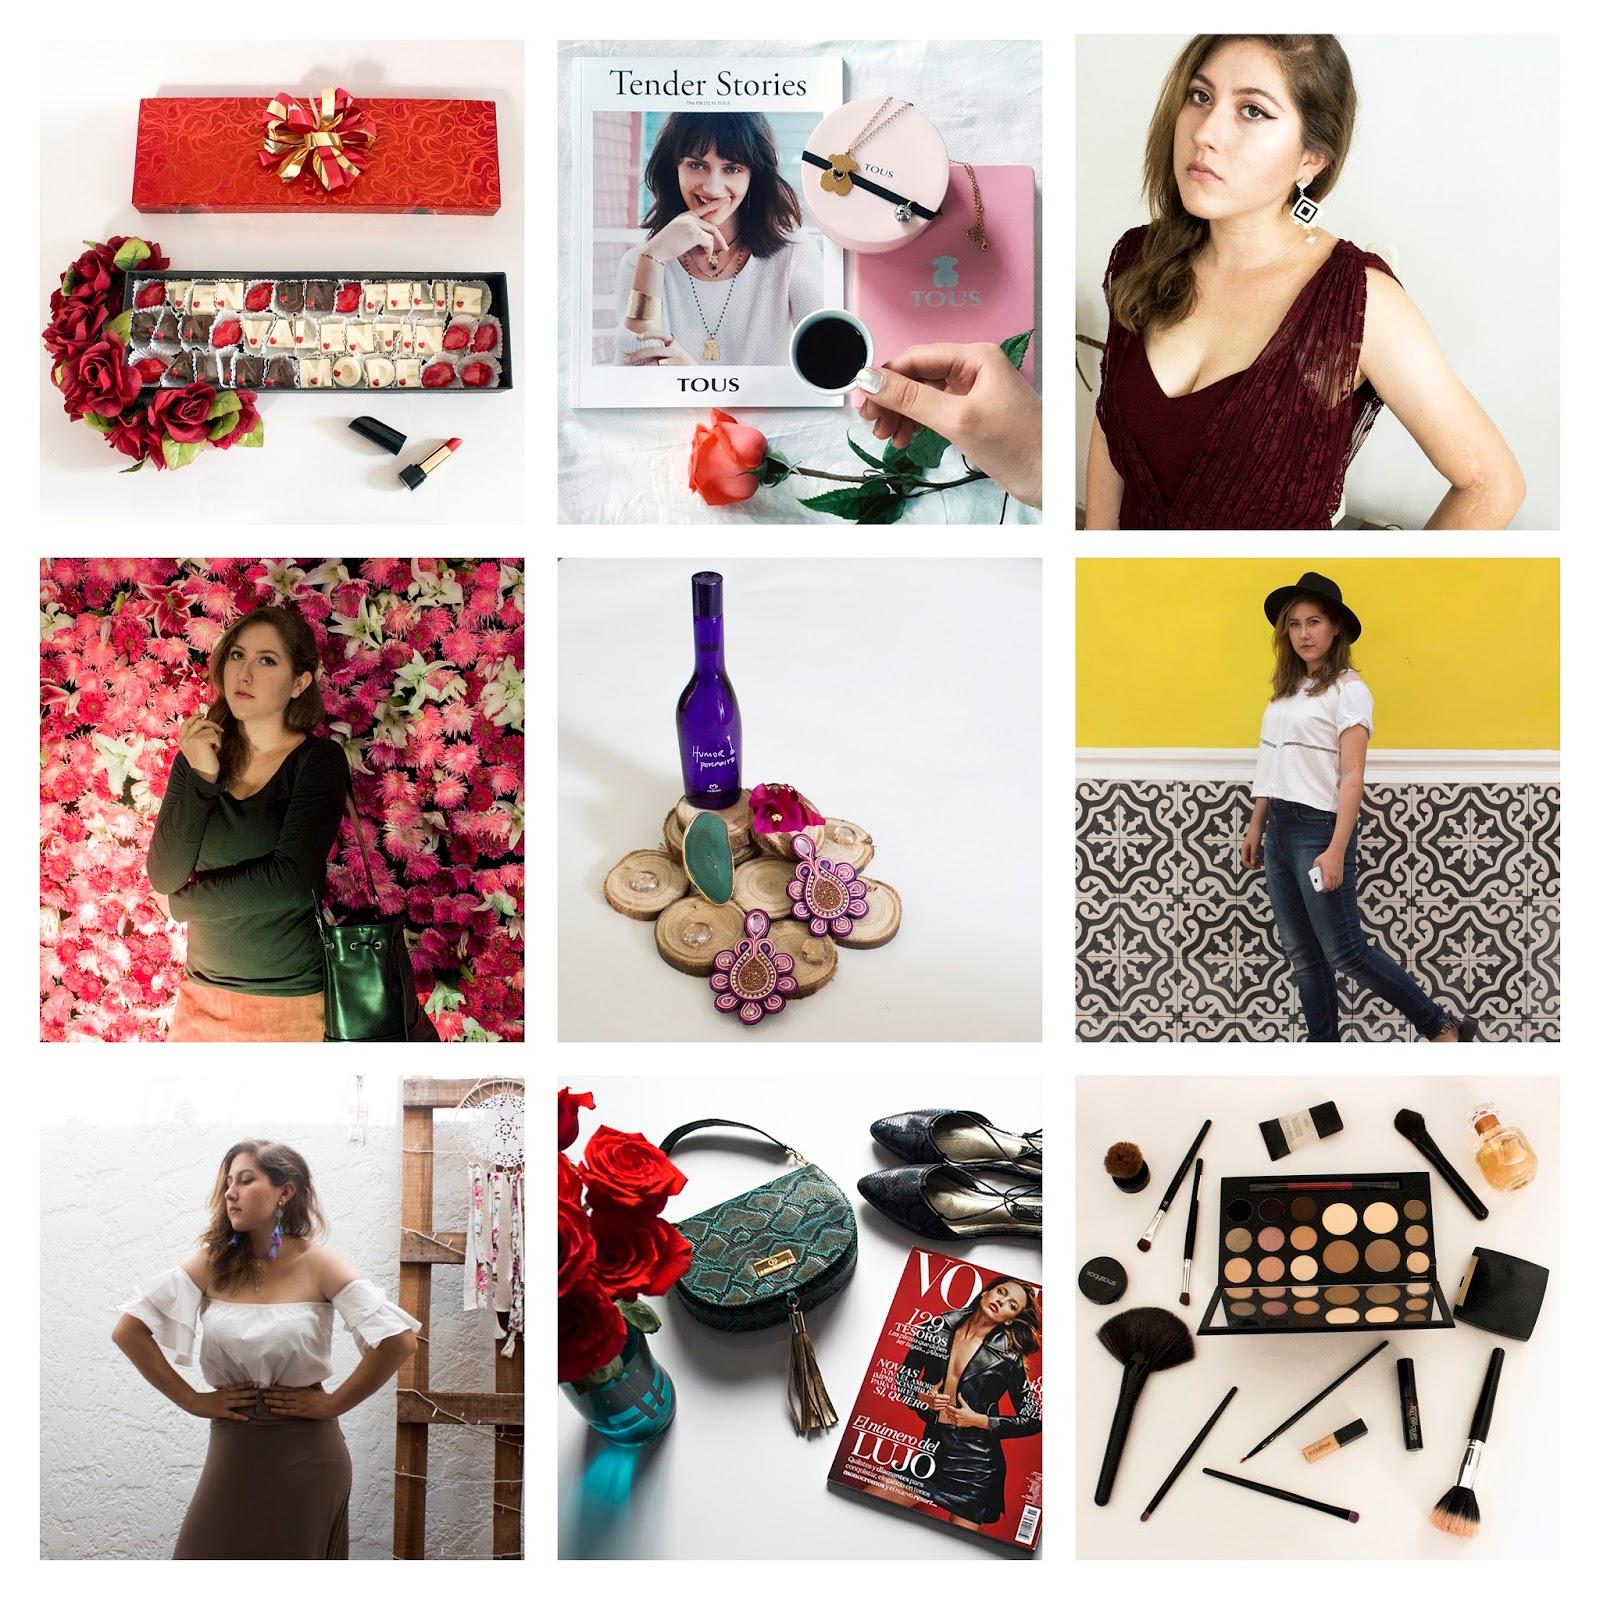 alina a la mode, fashionblogger colombia, como ganar dinero con un blog